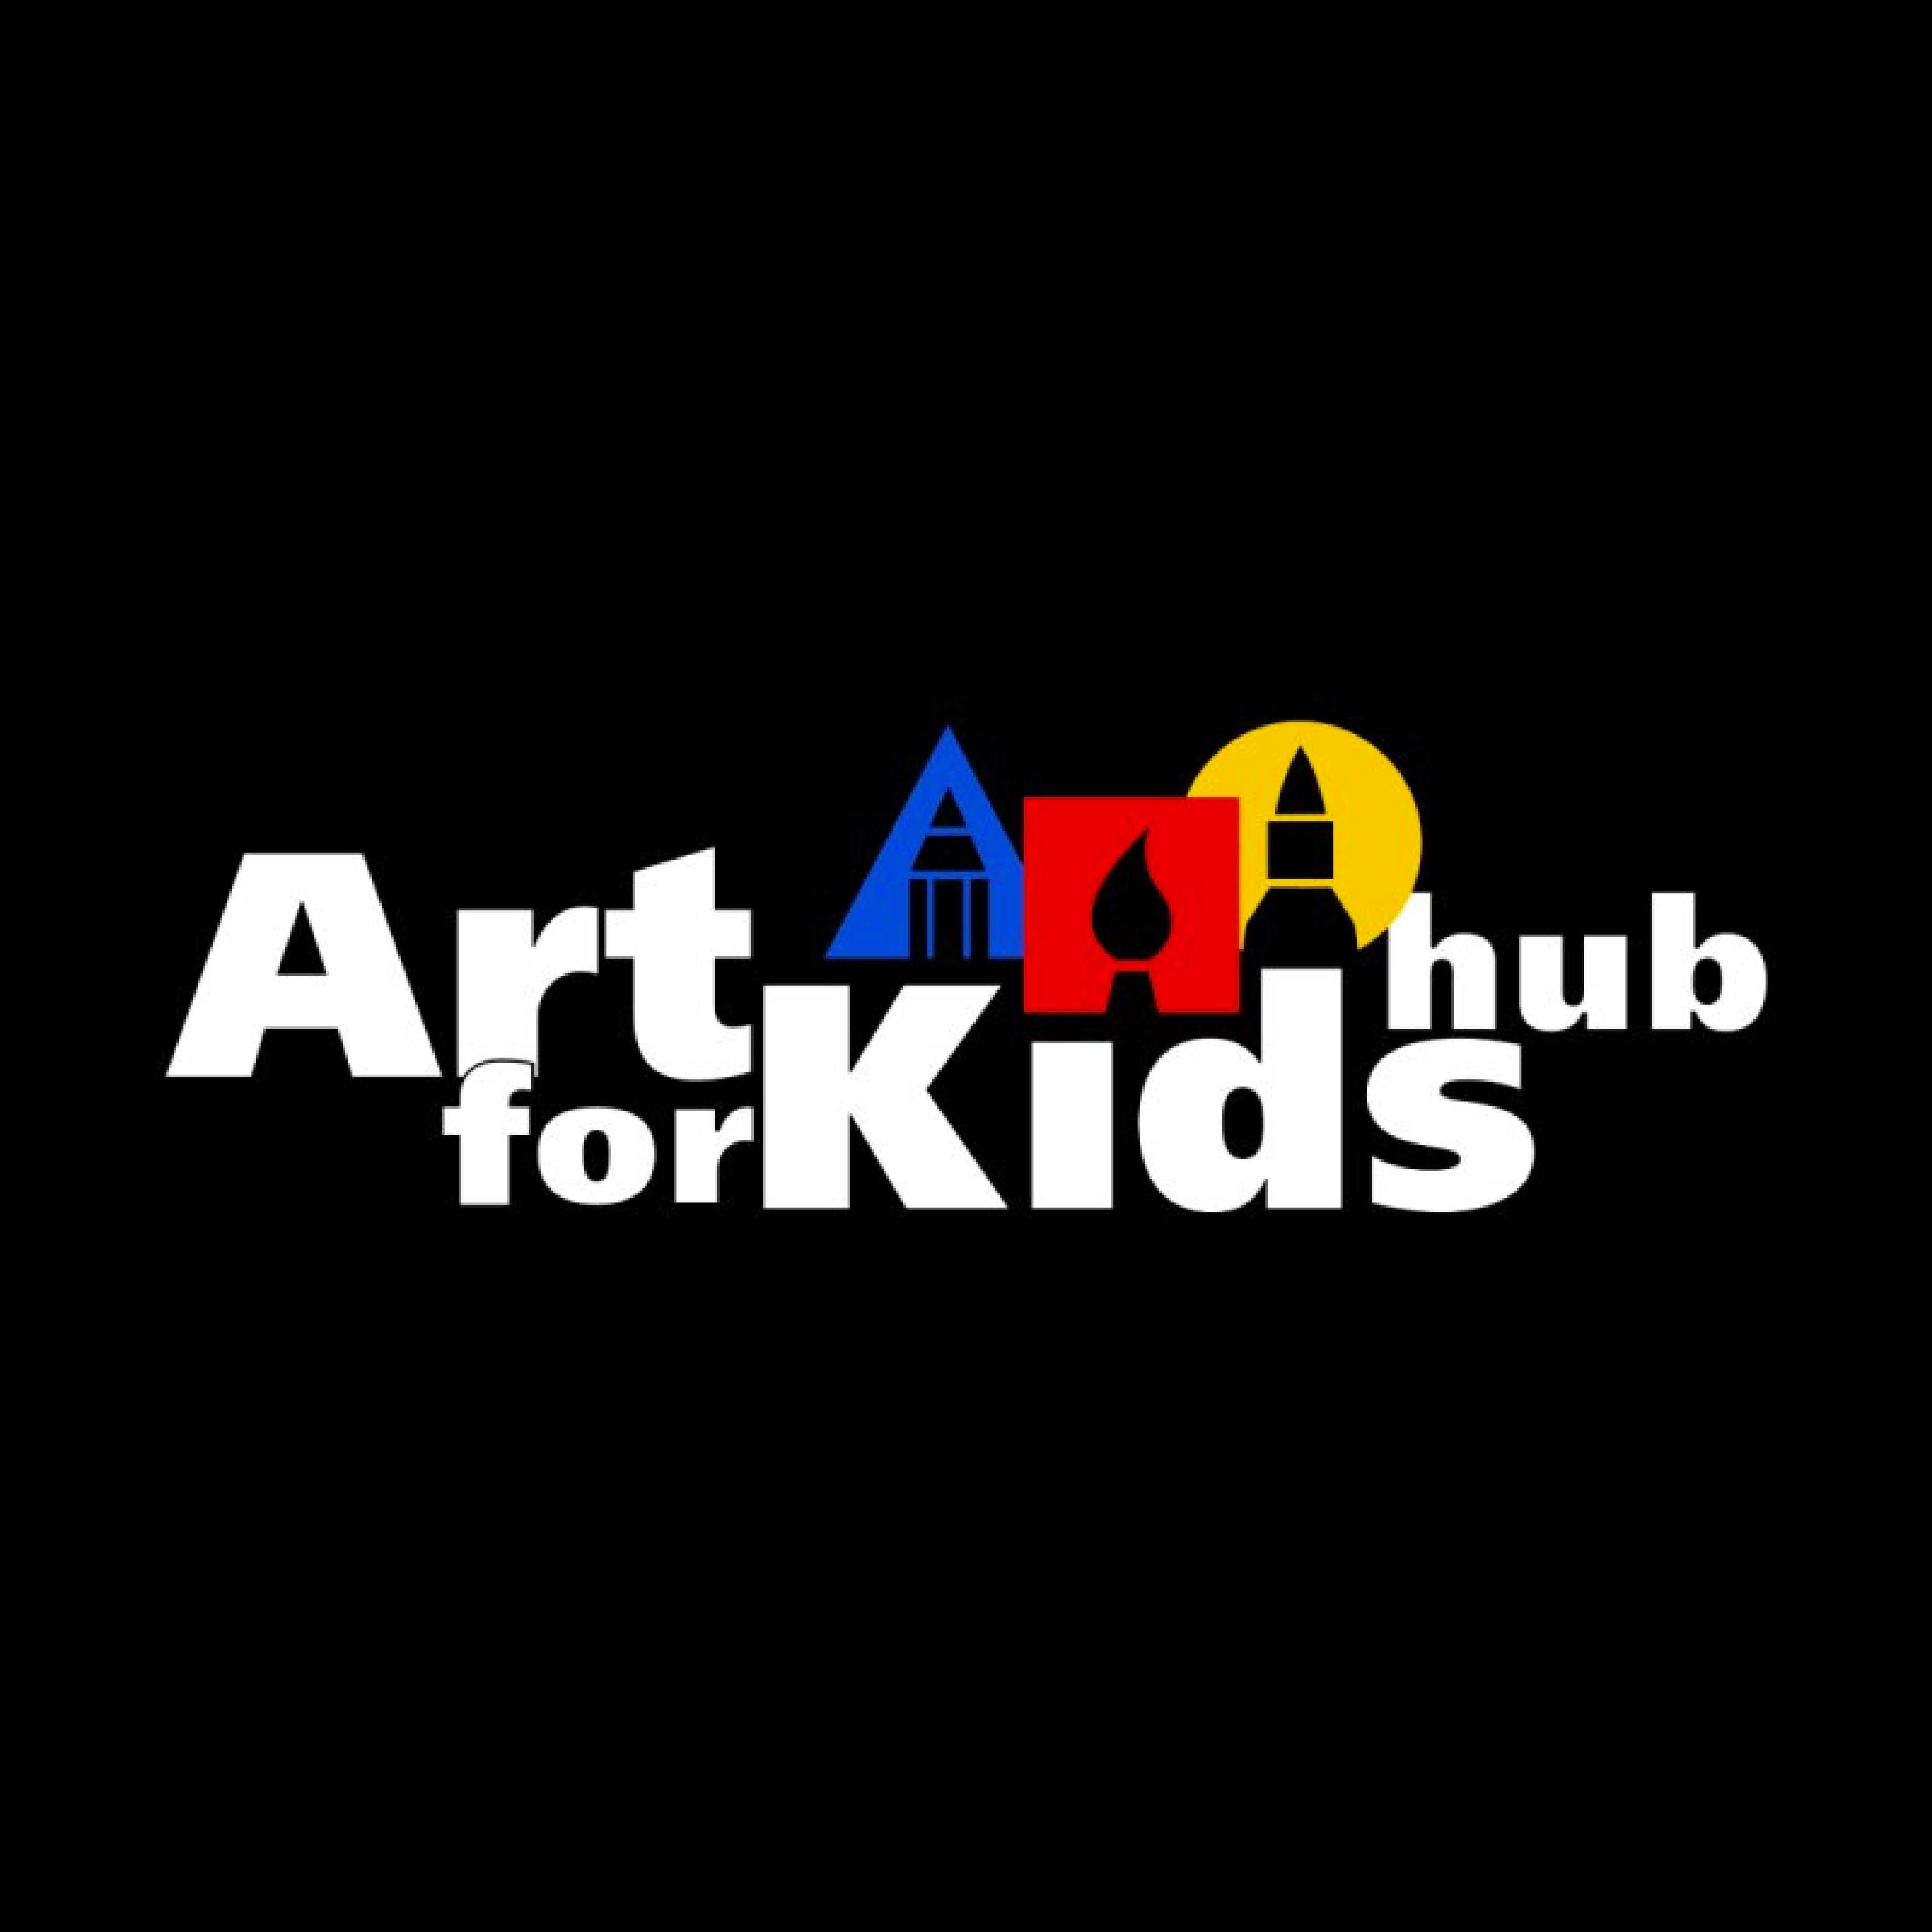 ArtHub-01.jpg